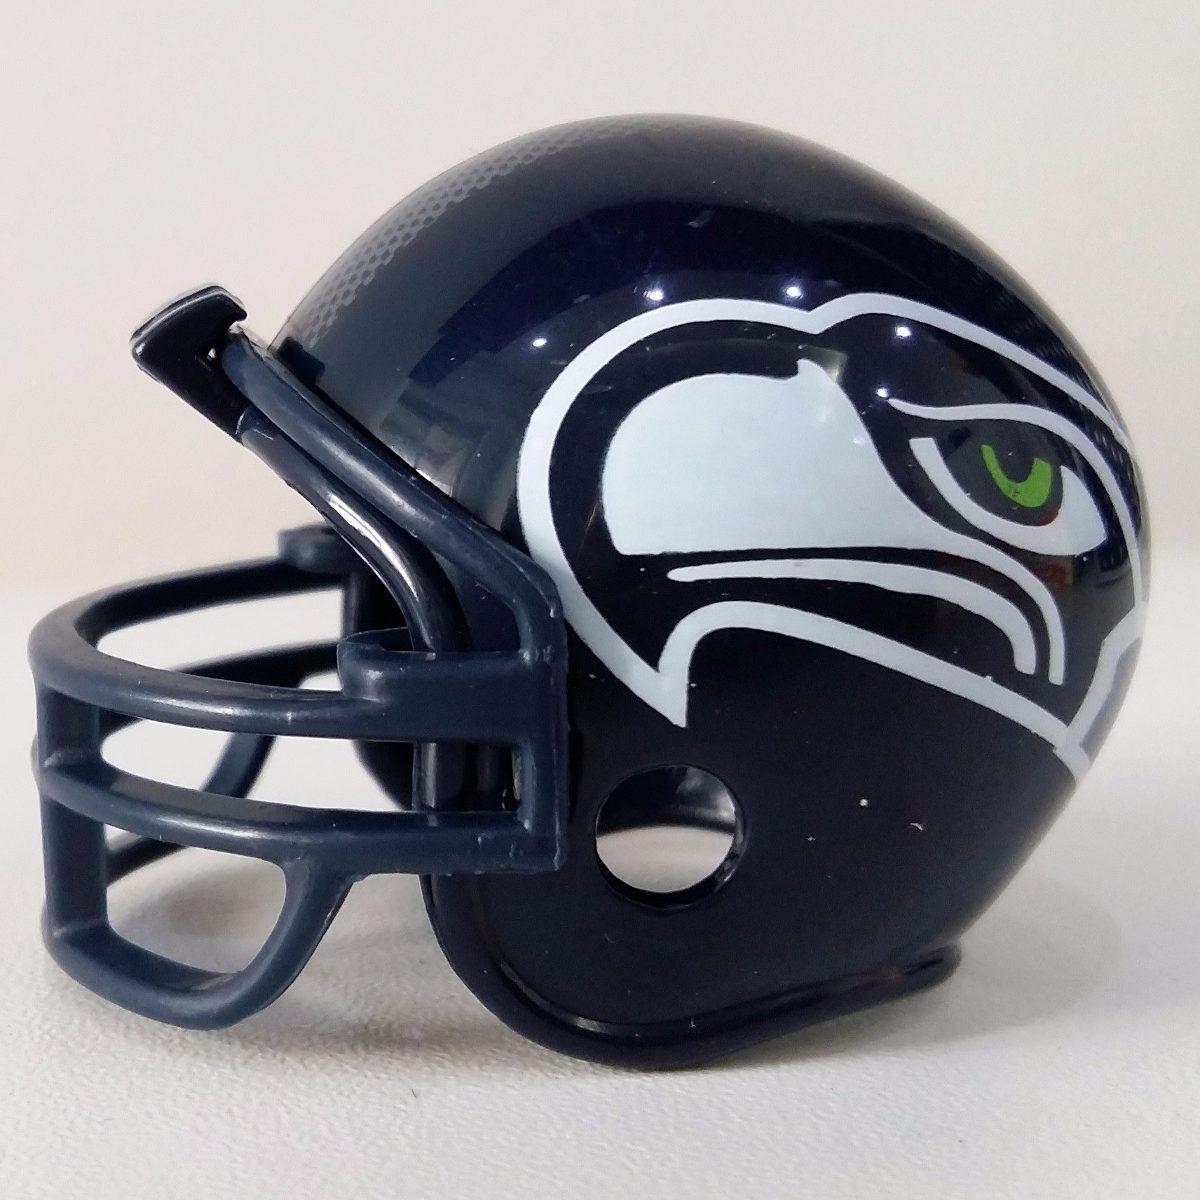 597f86250 mini capacete futebol americano nfl - seattle seahawks 5cm. Carregando zoom.